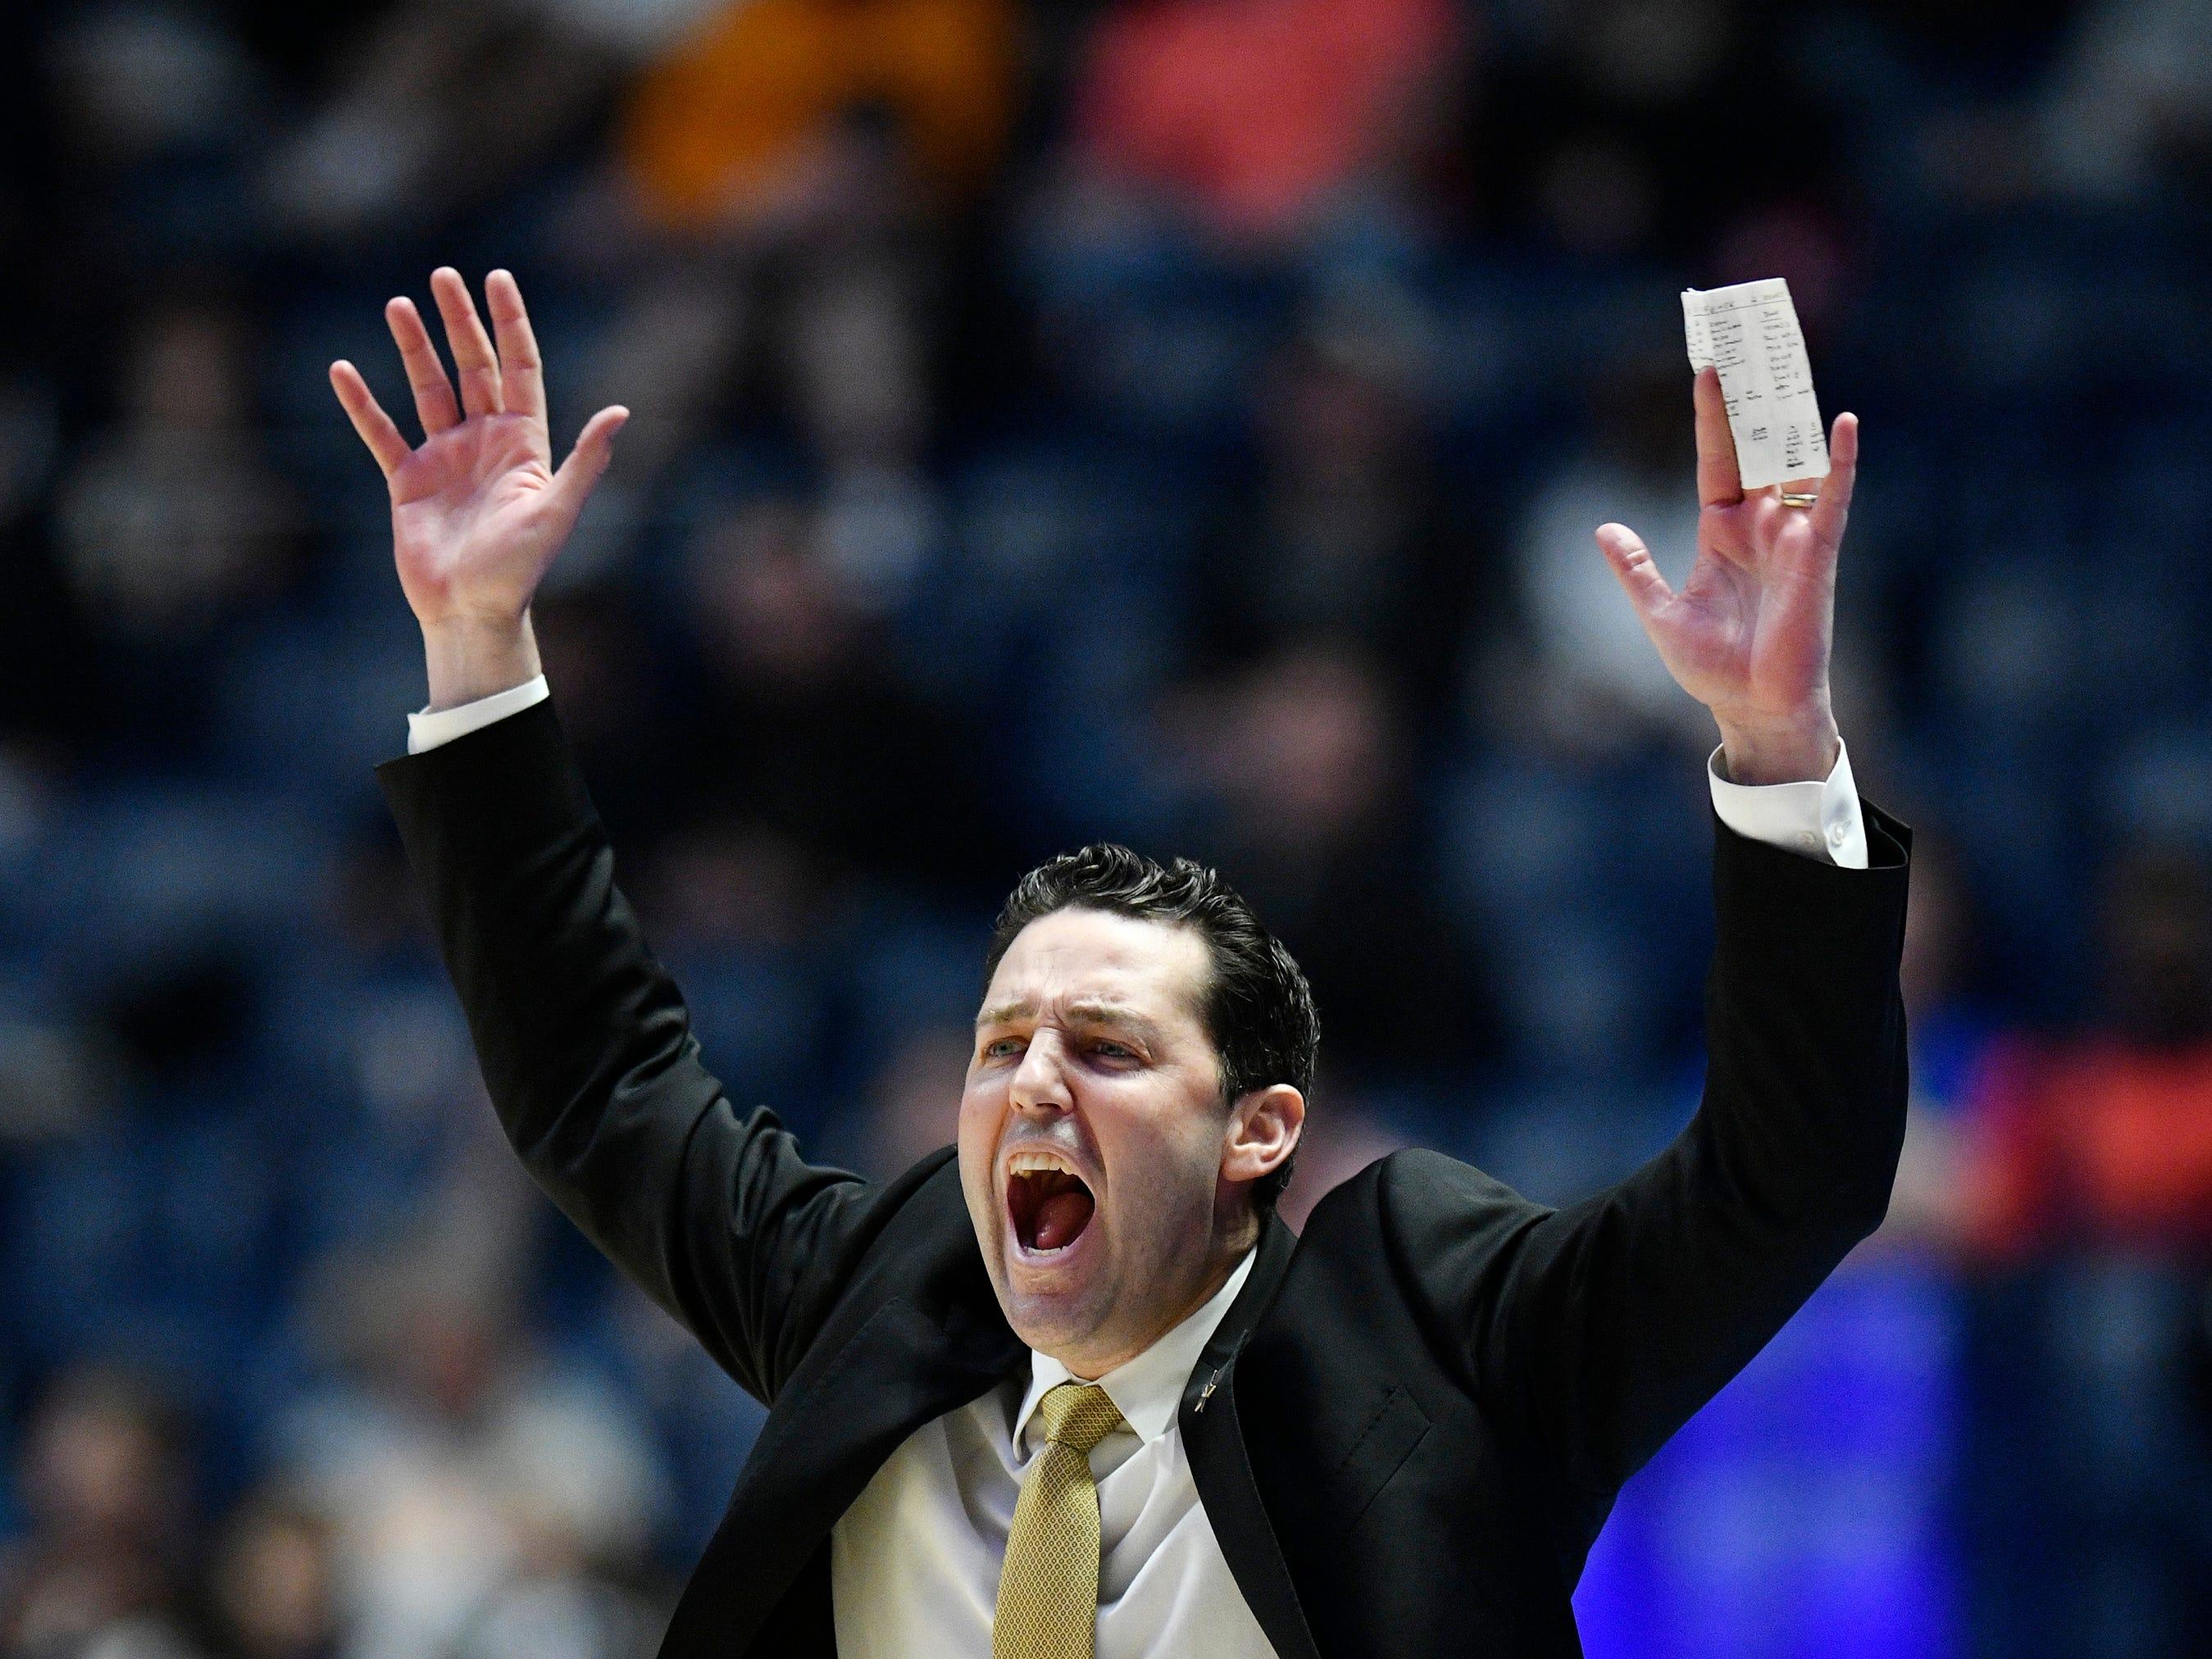 Vanderbilt head coach Bryce Drew yells to his team during the second half of the SEC Men's Basketball Tournament game at Bridgestone Arena in Nashville, Tenn., Wednesday, March 13, 2019.